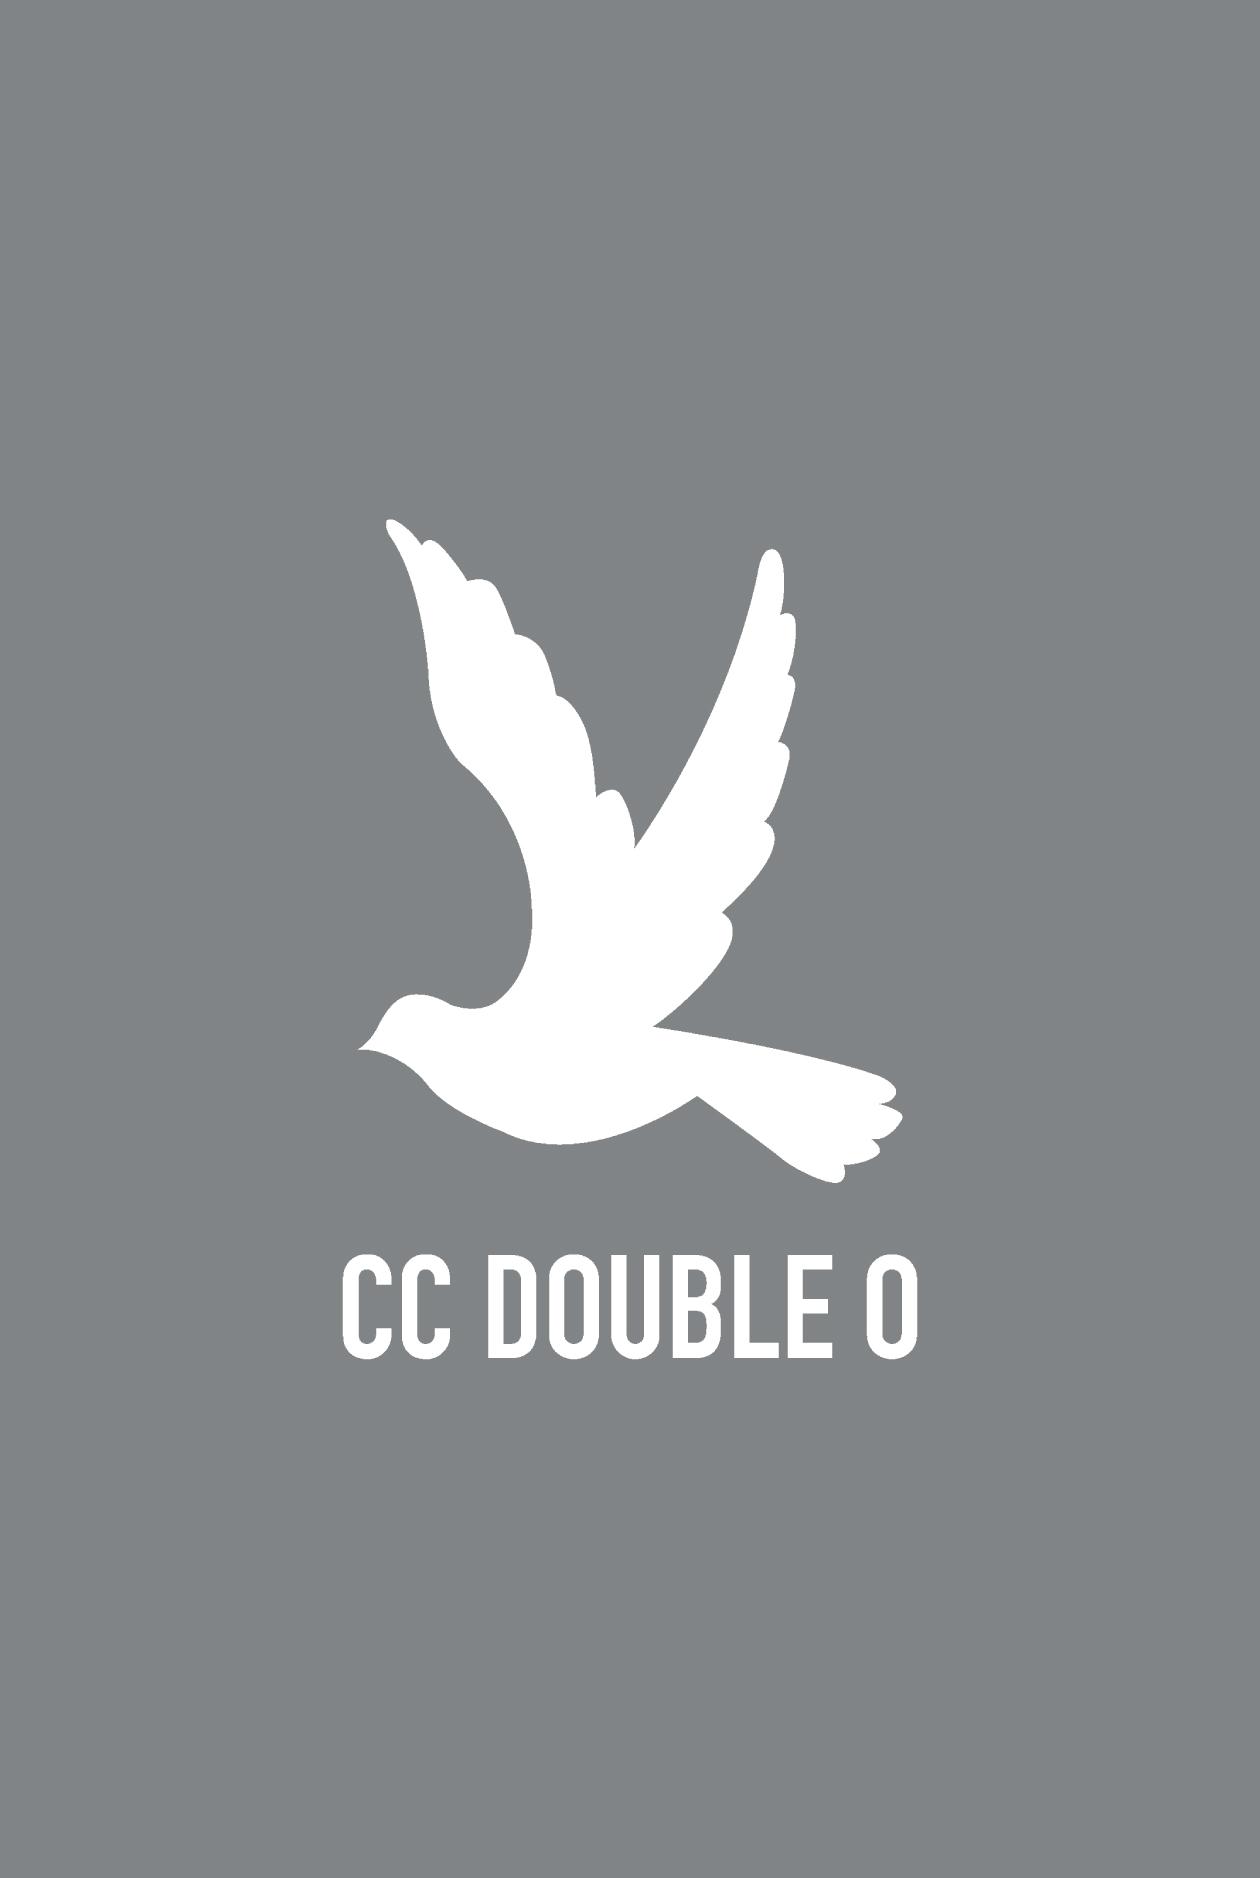 CC DOUBLE O FLIP FLOPS IN COLOR BLOCK DESIGN